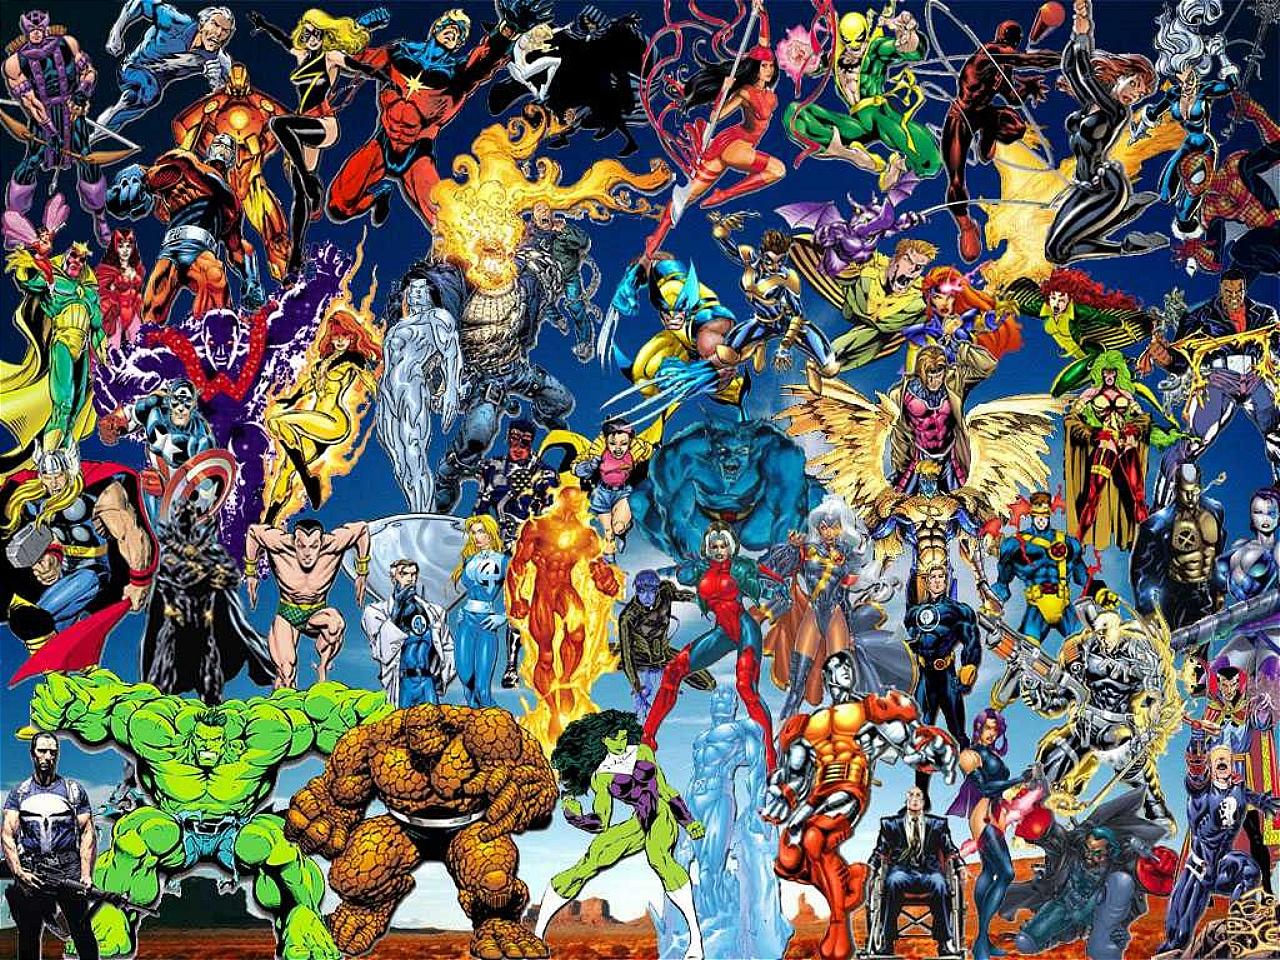 http://4.bp.blogspot.com/-xRKr8oiKDUY/TeKzjbhreVI/AAAAAAAAAQI/4jzMf6iIBL0/s1600/marvel-comics-wallpapers-8.jpg